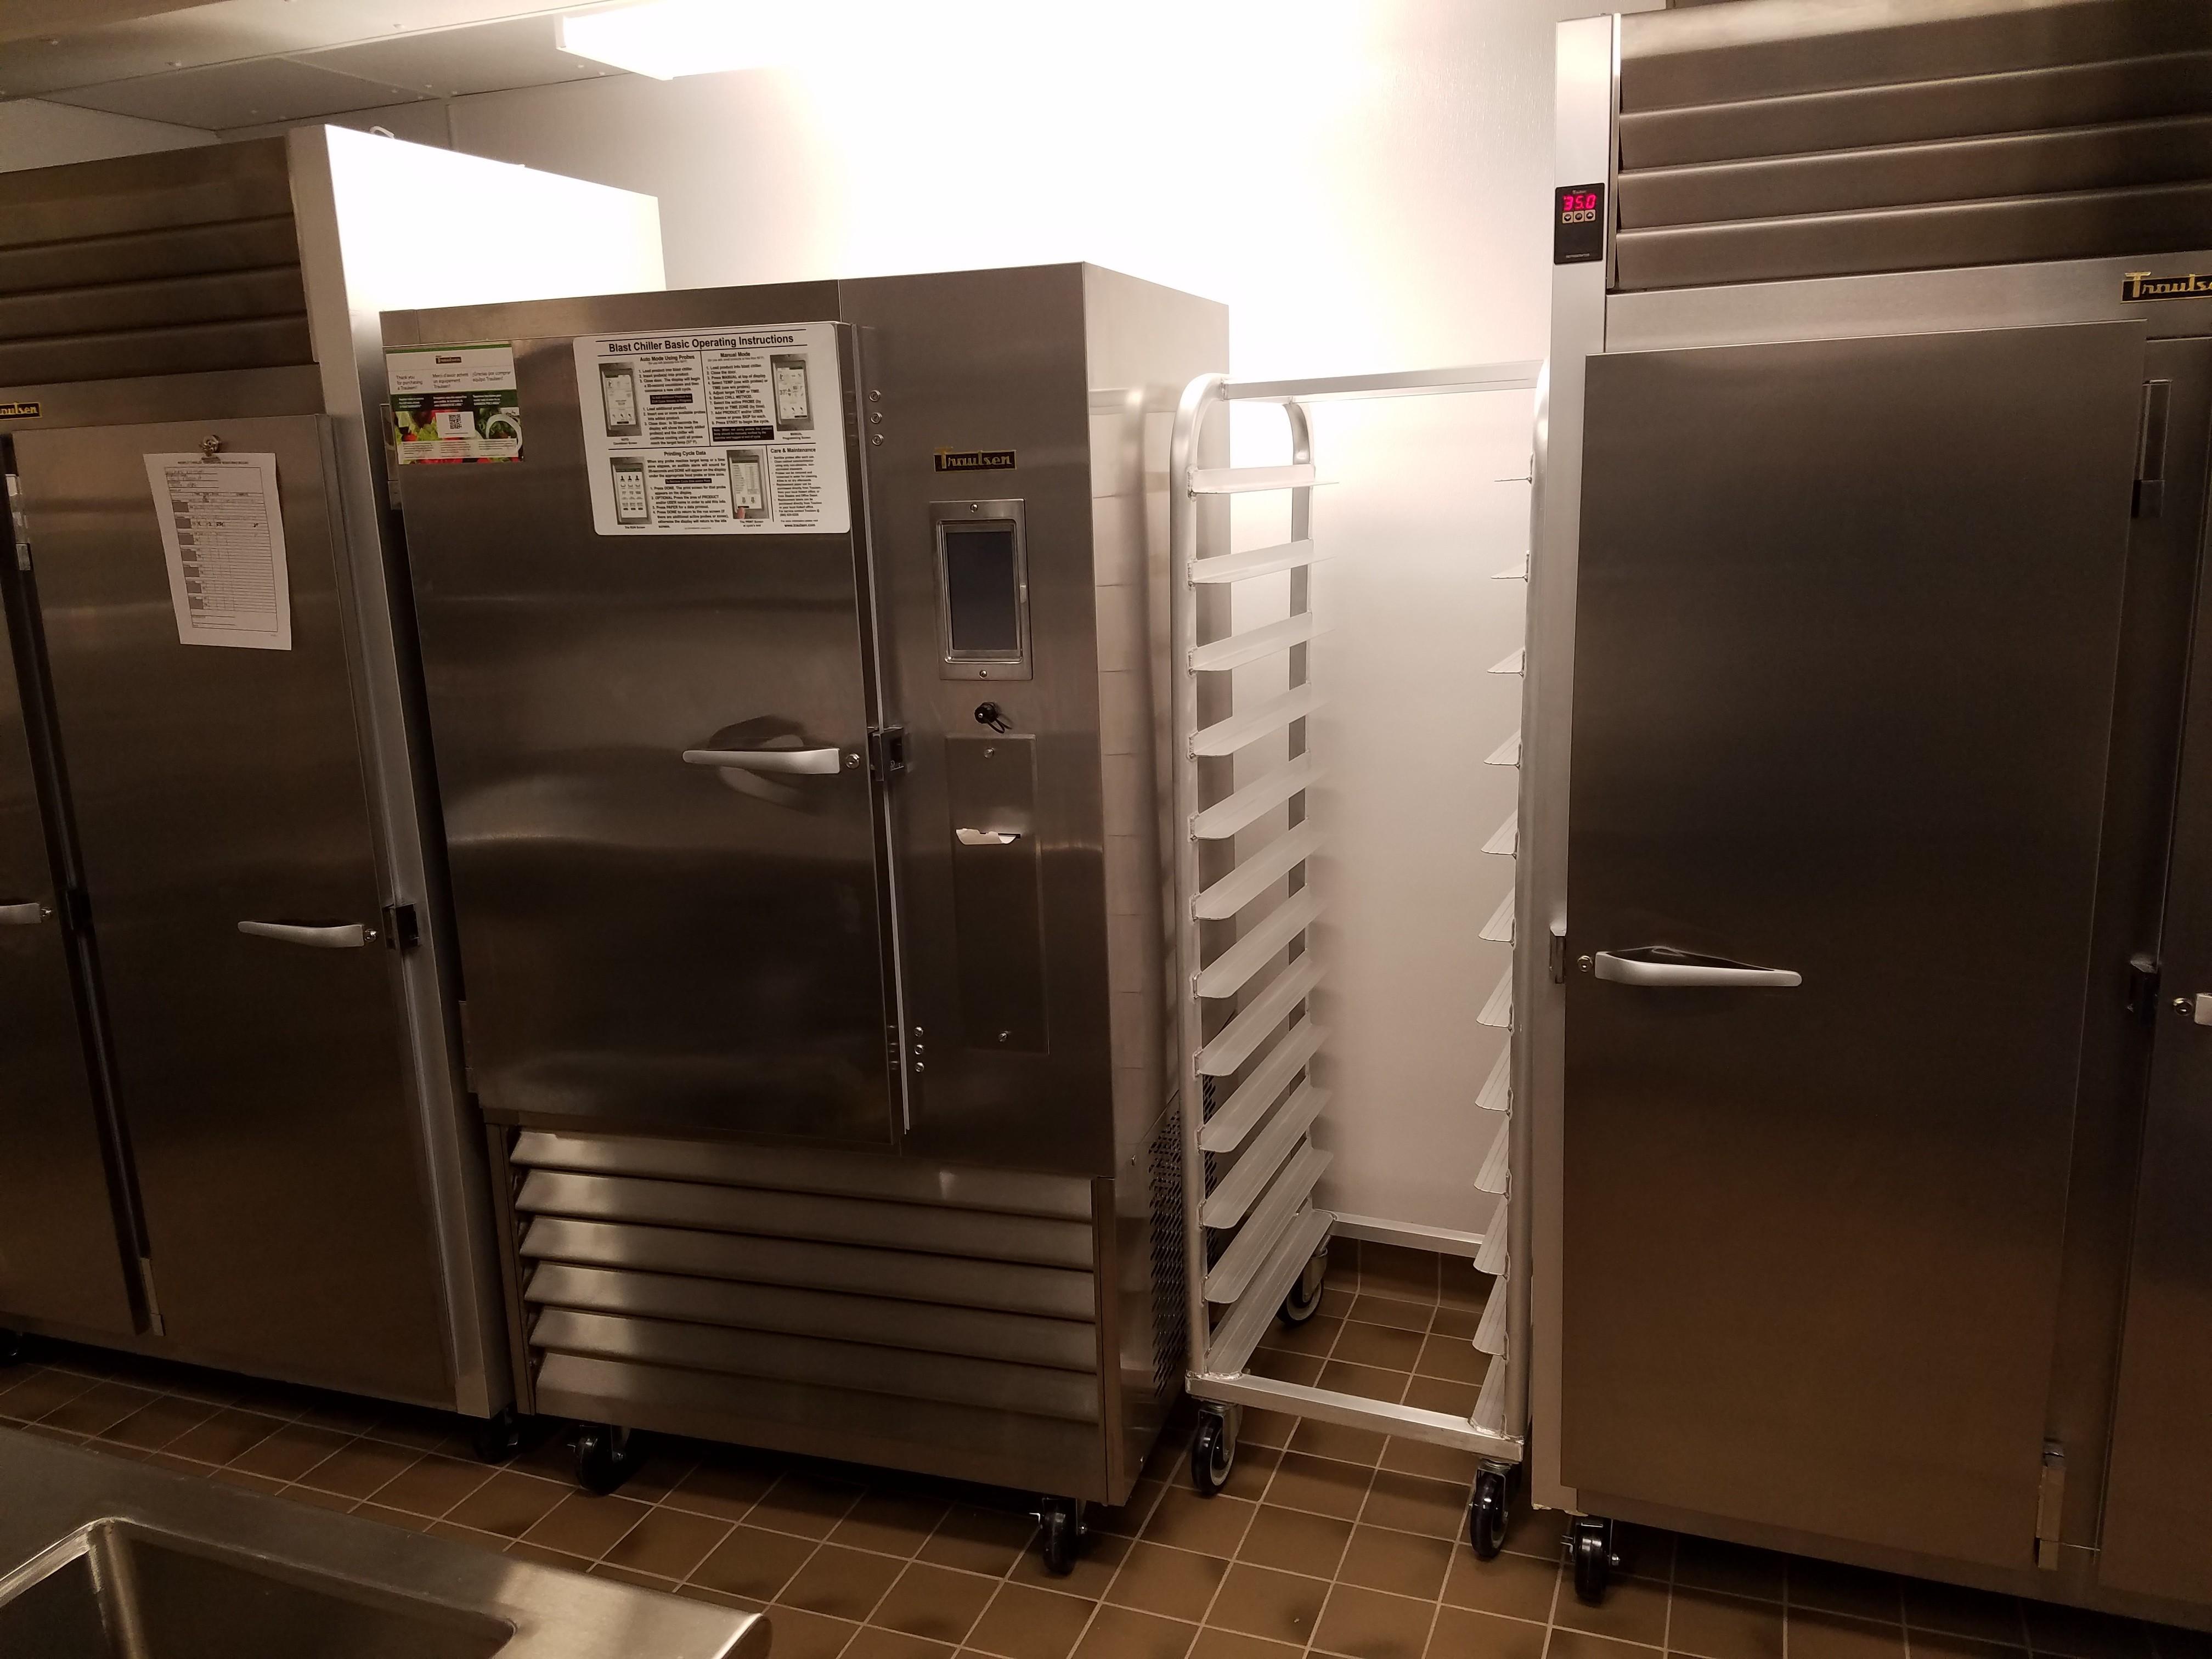 blast chiller, freezer and refrigerator